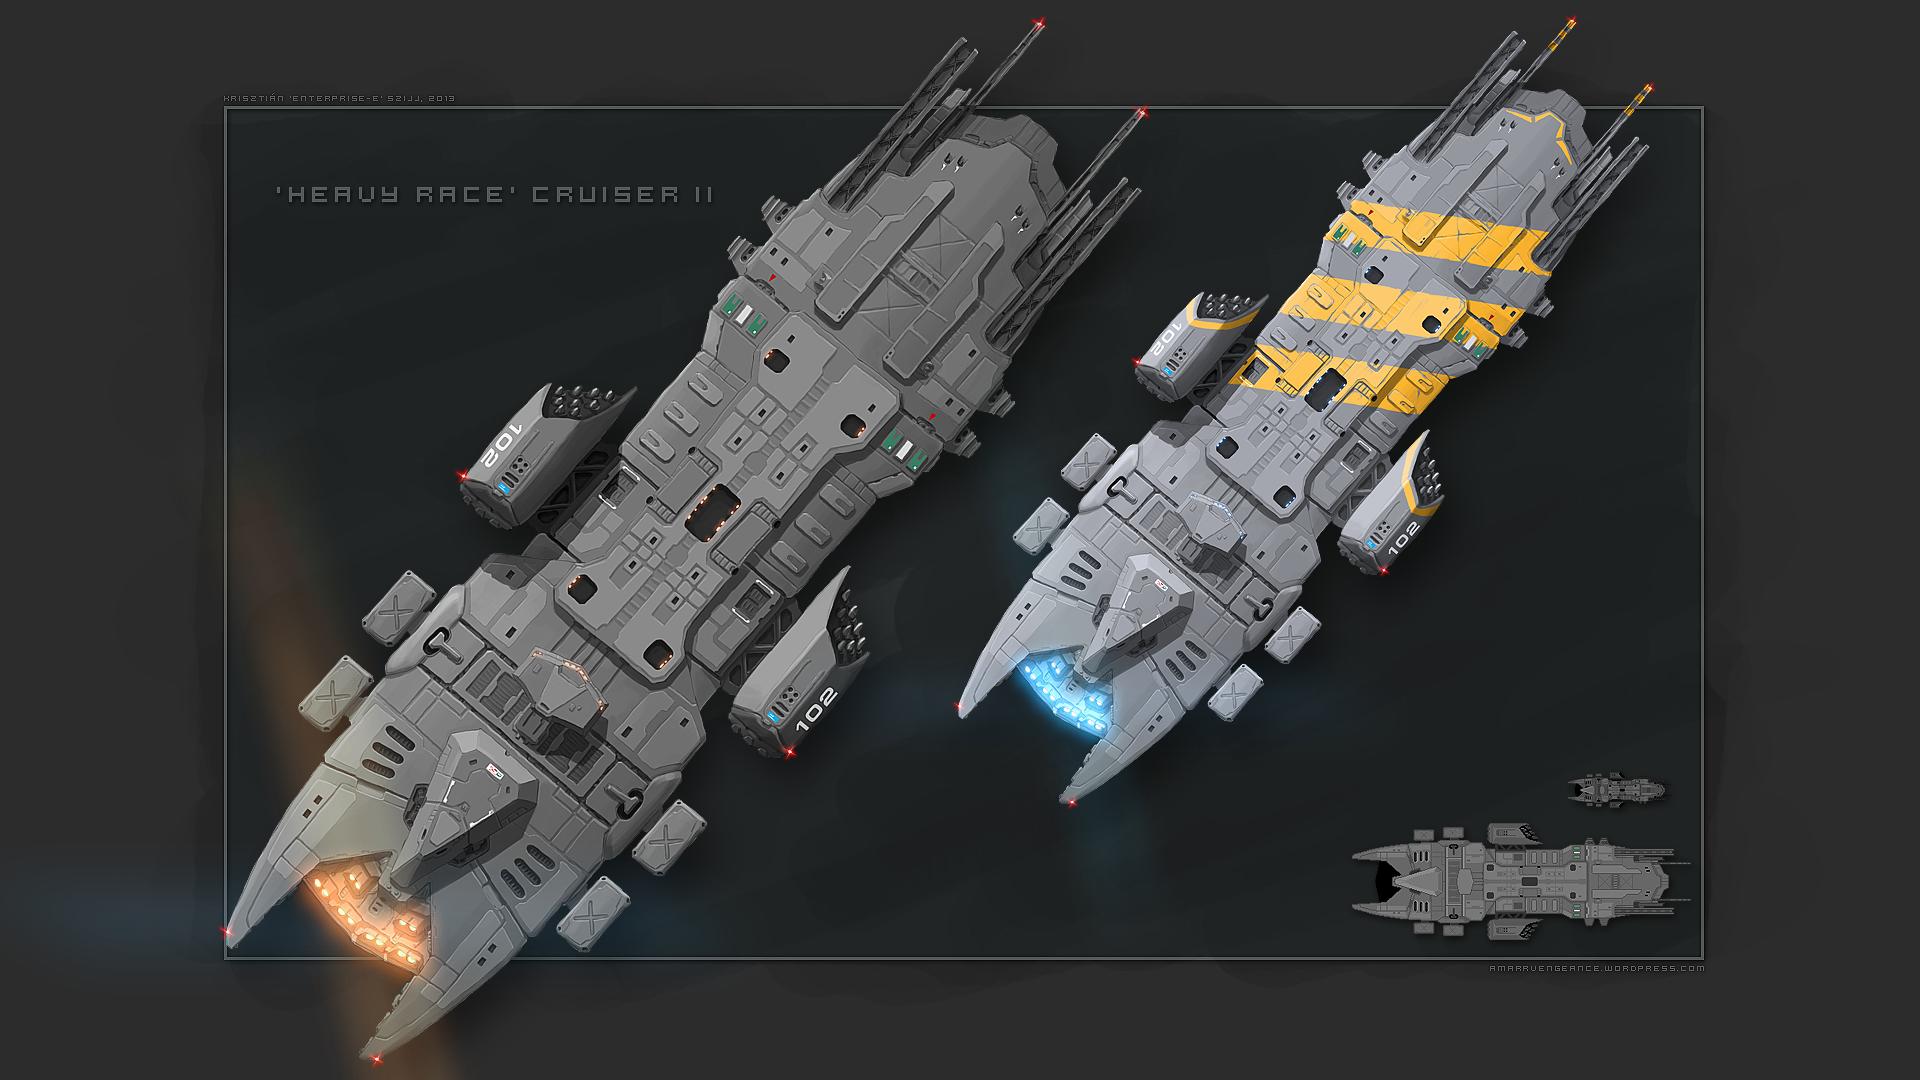 Heavy II concept by Enterprise-E